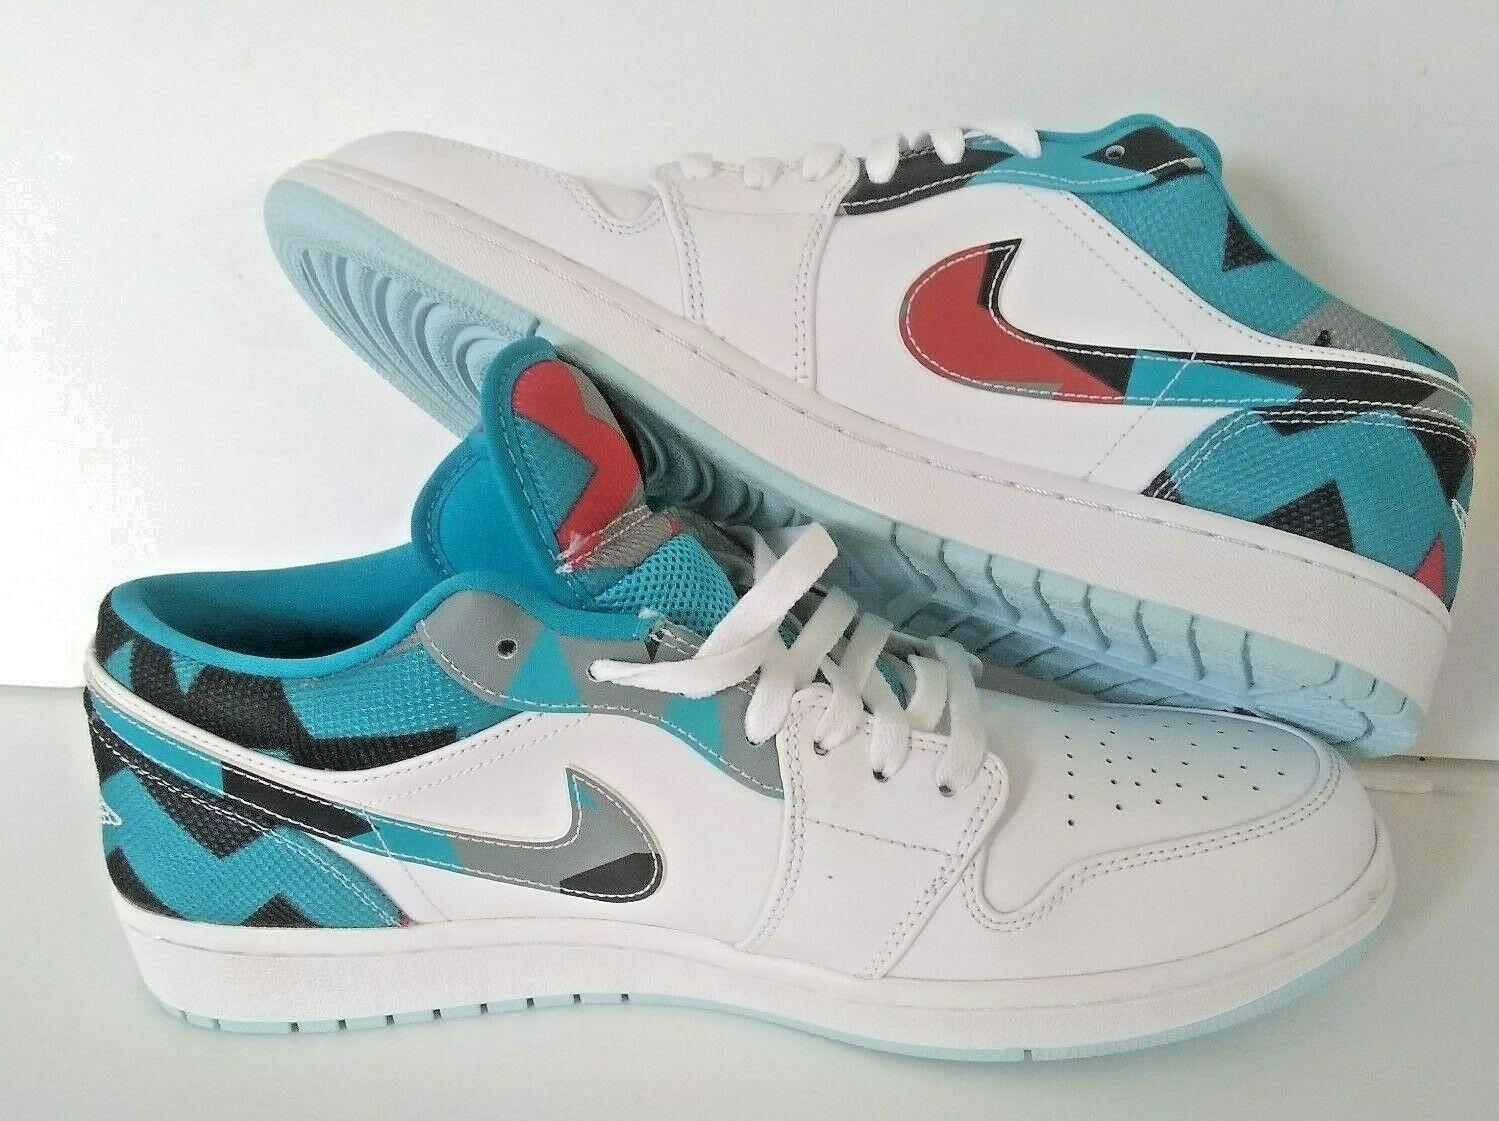 NEW Nike Air Jordan 1 Low N7 White Black Black Black Turquoise-Ice bluee Size 13 744805-100 b22b86